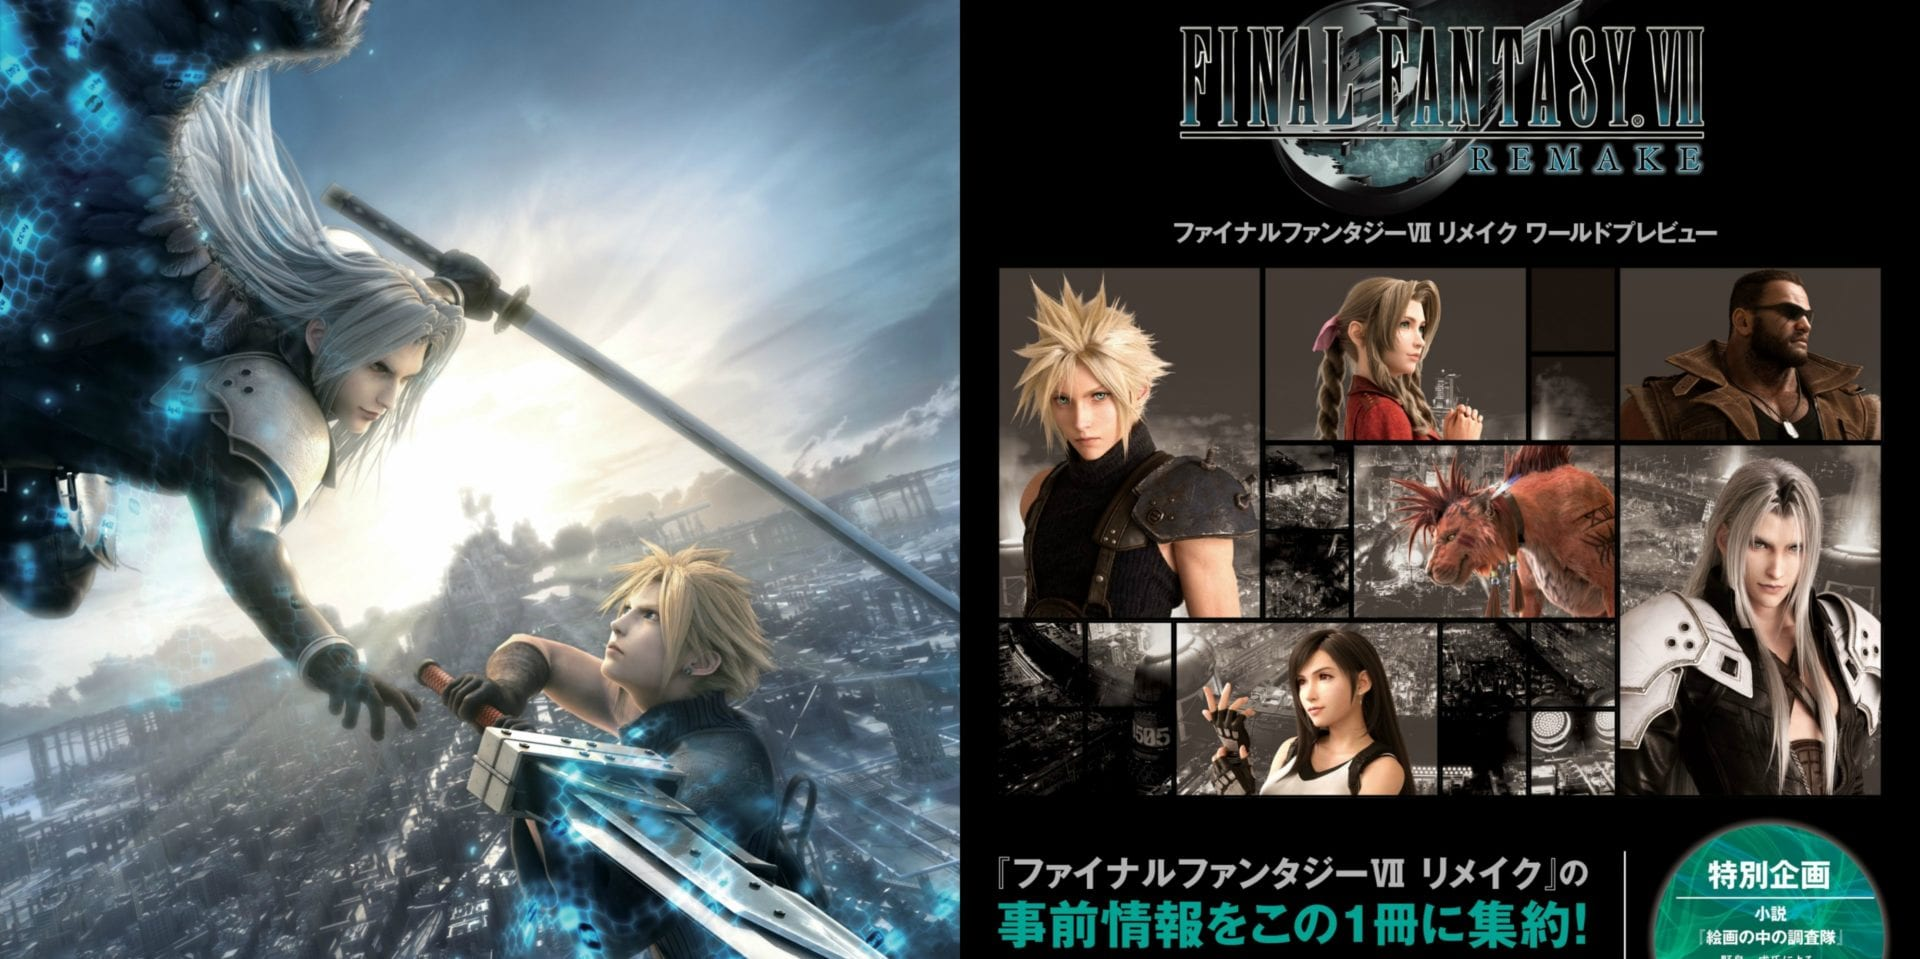 Final Fantasy VII Remake, Square Enix